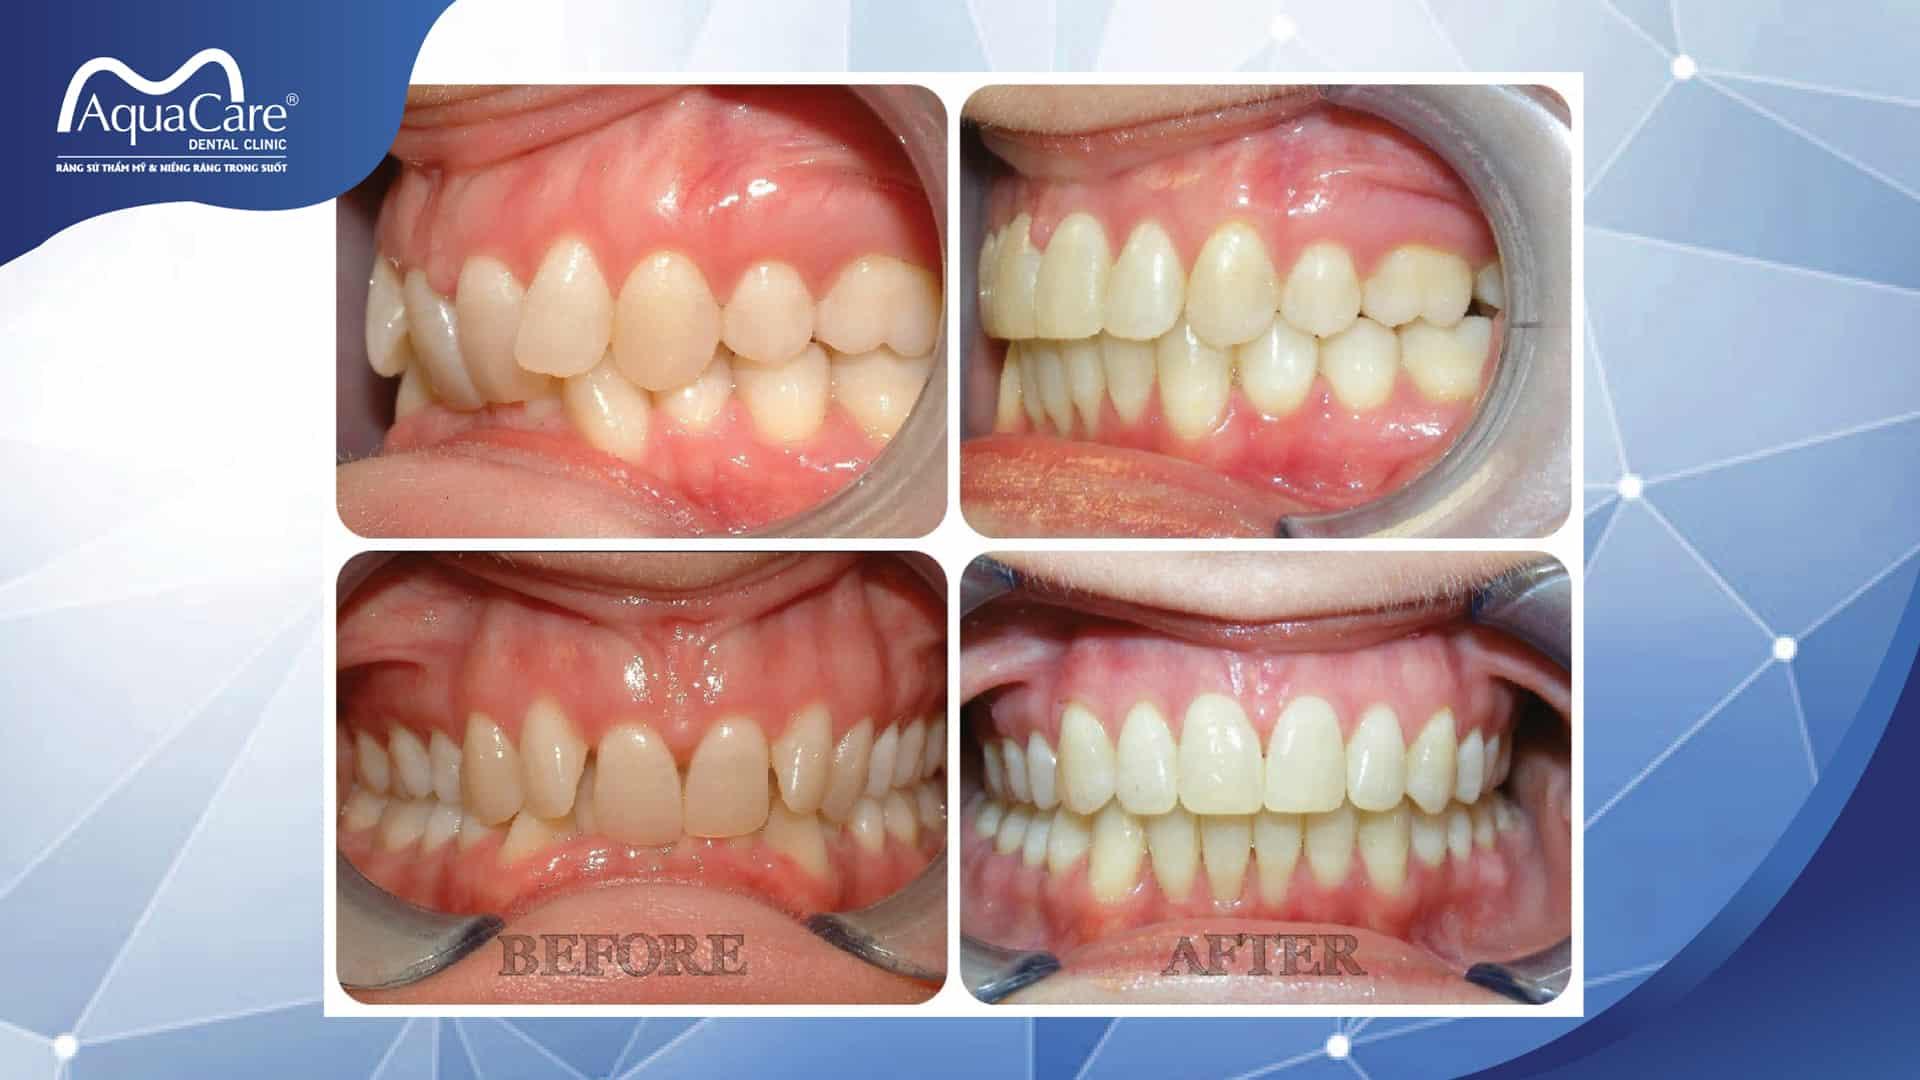 răng sai khớp cắn